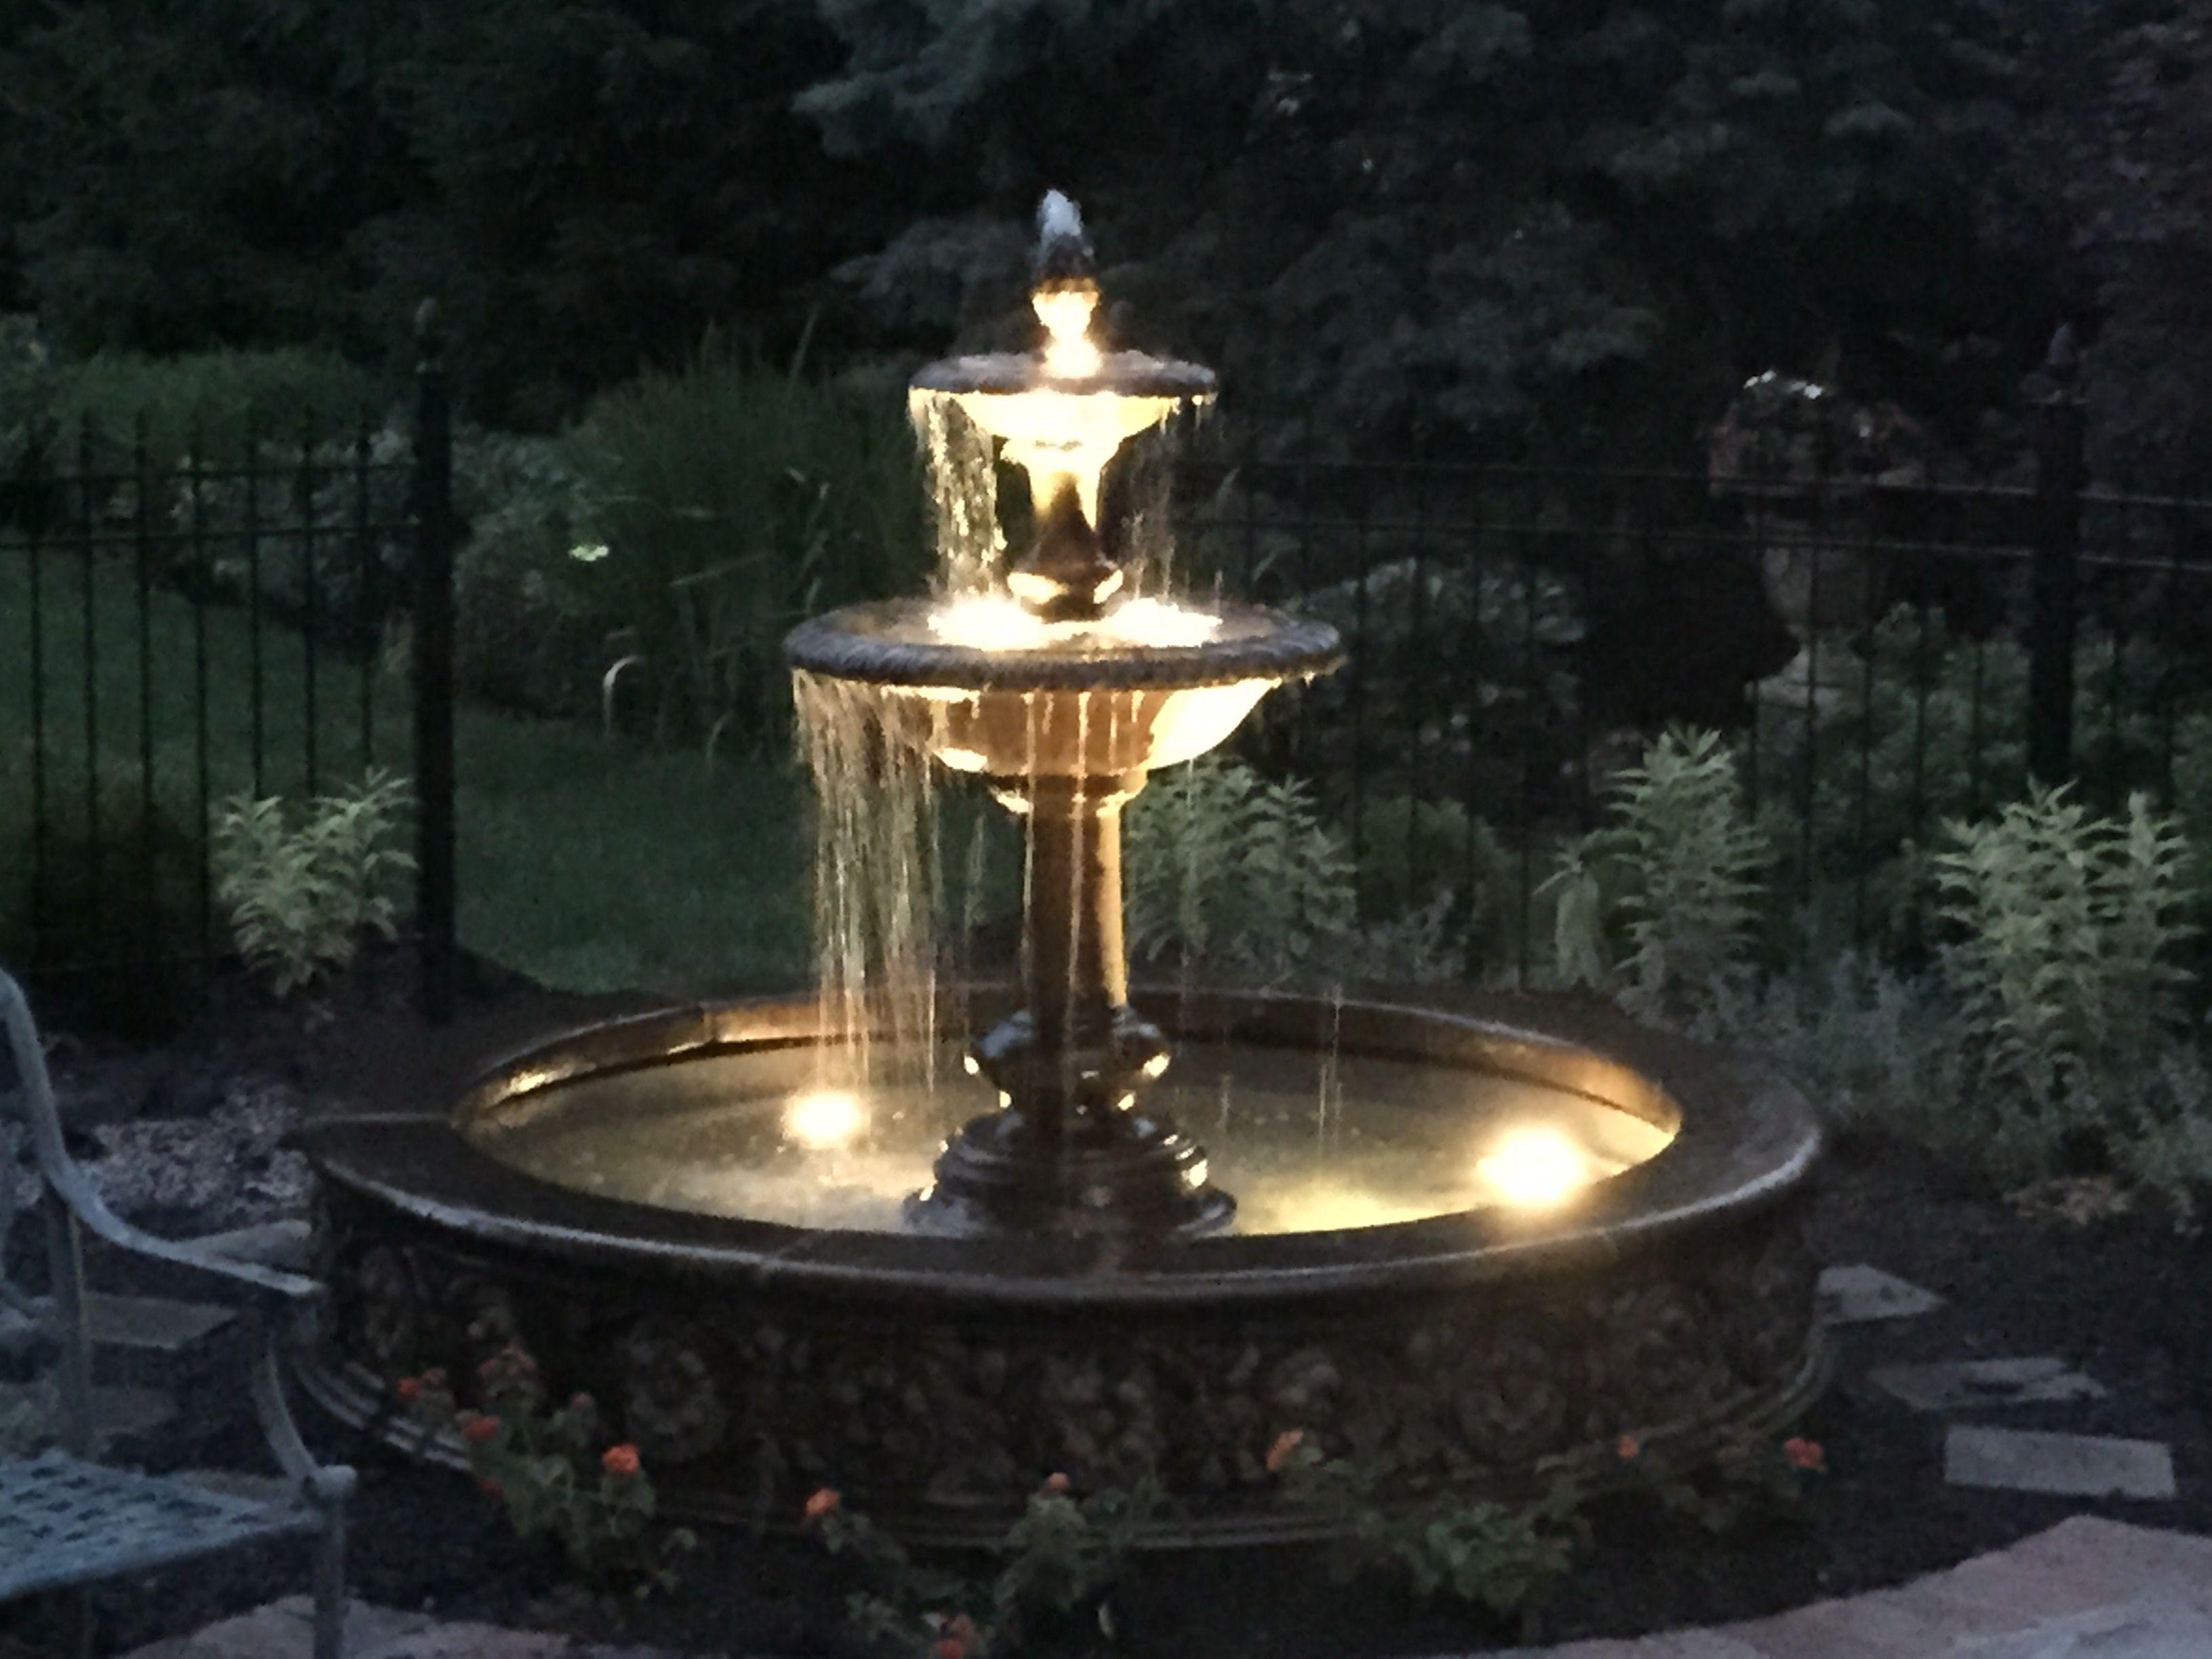 Febox Uploads Fotos Outdoor Water Feature Lighting 19693 3264 2448 Jpg